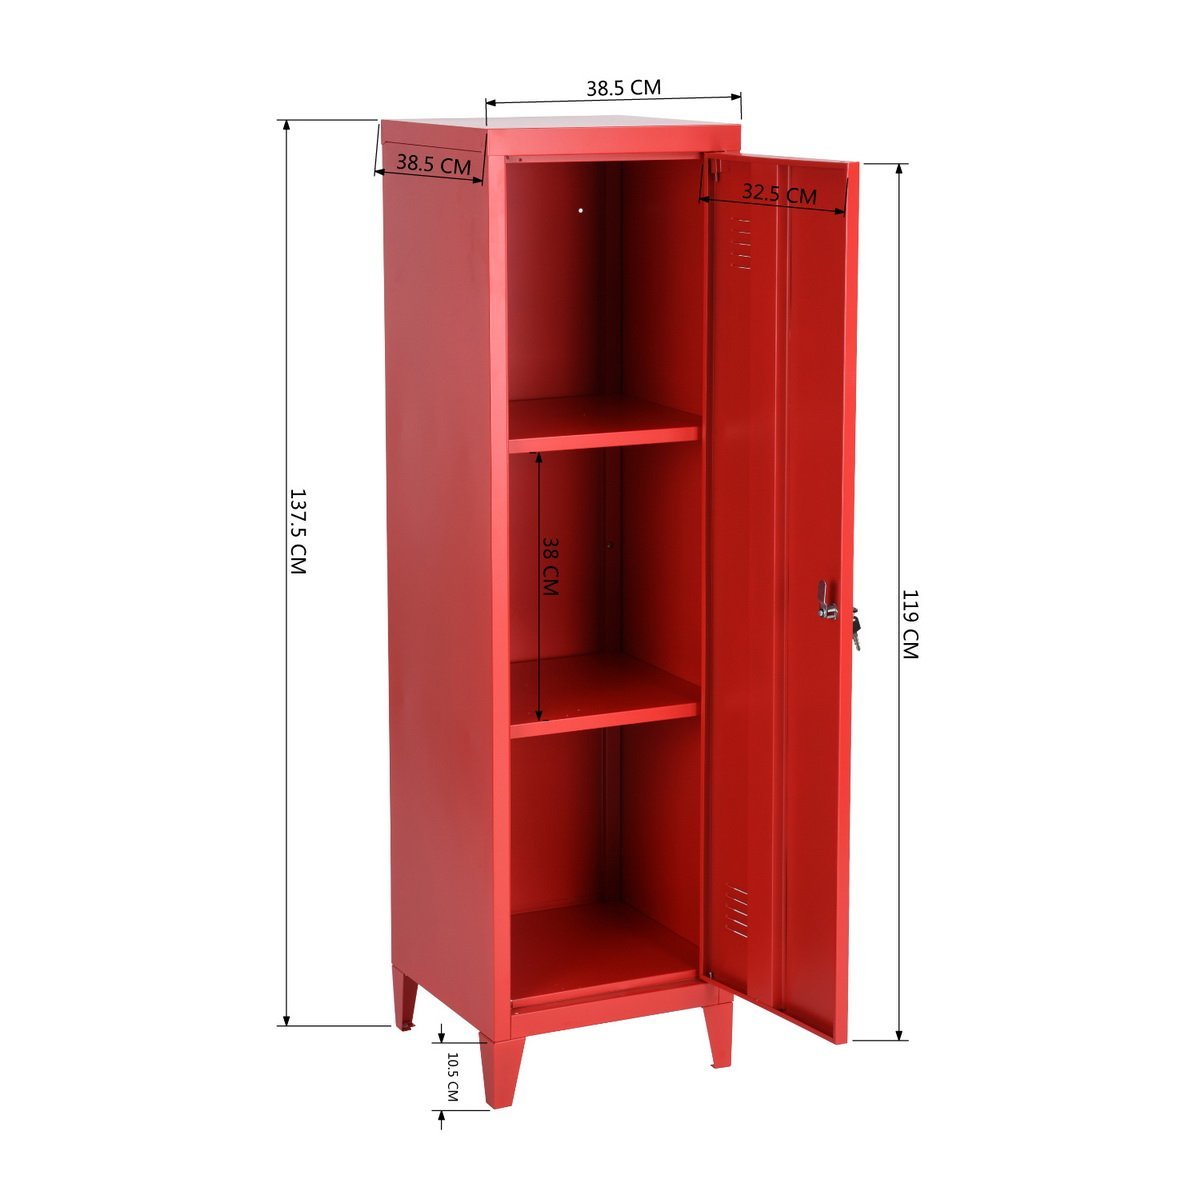 HouseinBox Office File Storage Metal Cabinet 3 Door Cupboard Locker Organizer Console Stand 3-in-1 (RED-Standing Locker) by HouseinBox (Image #8)